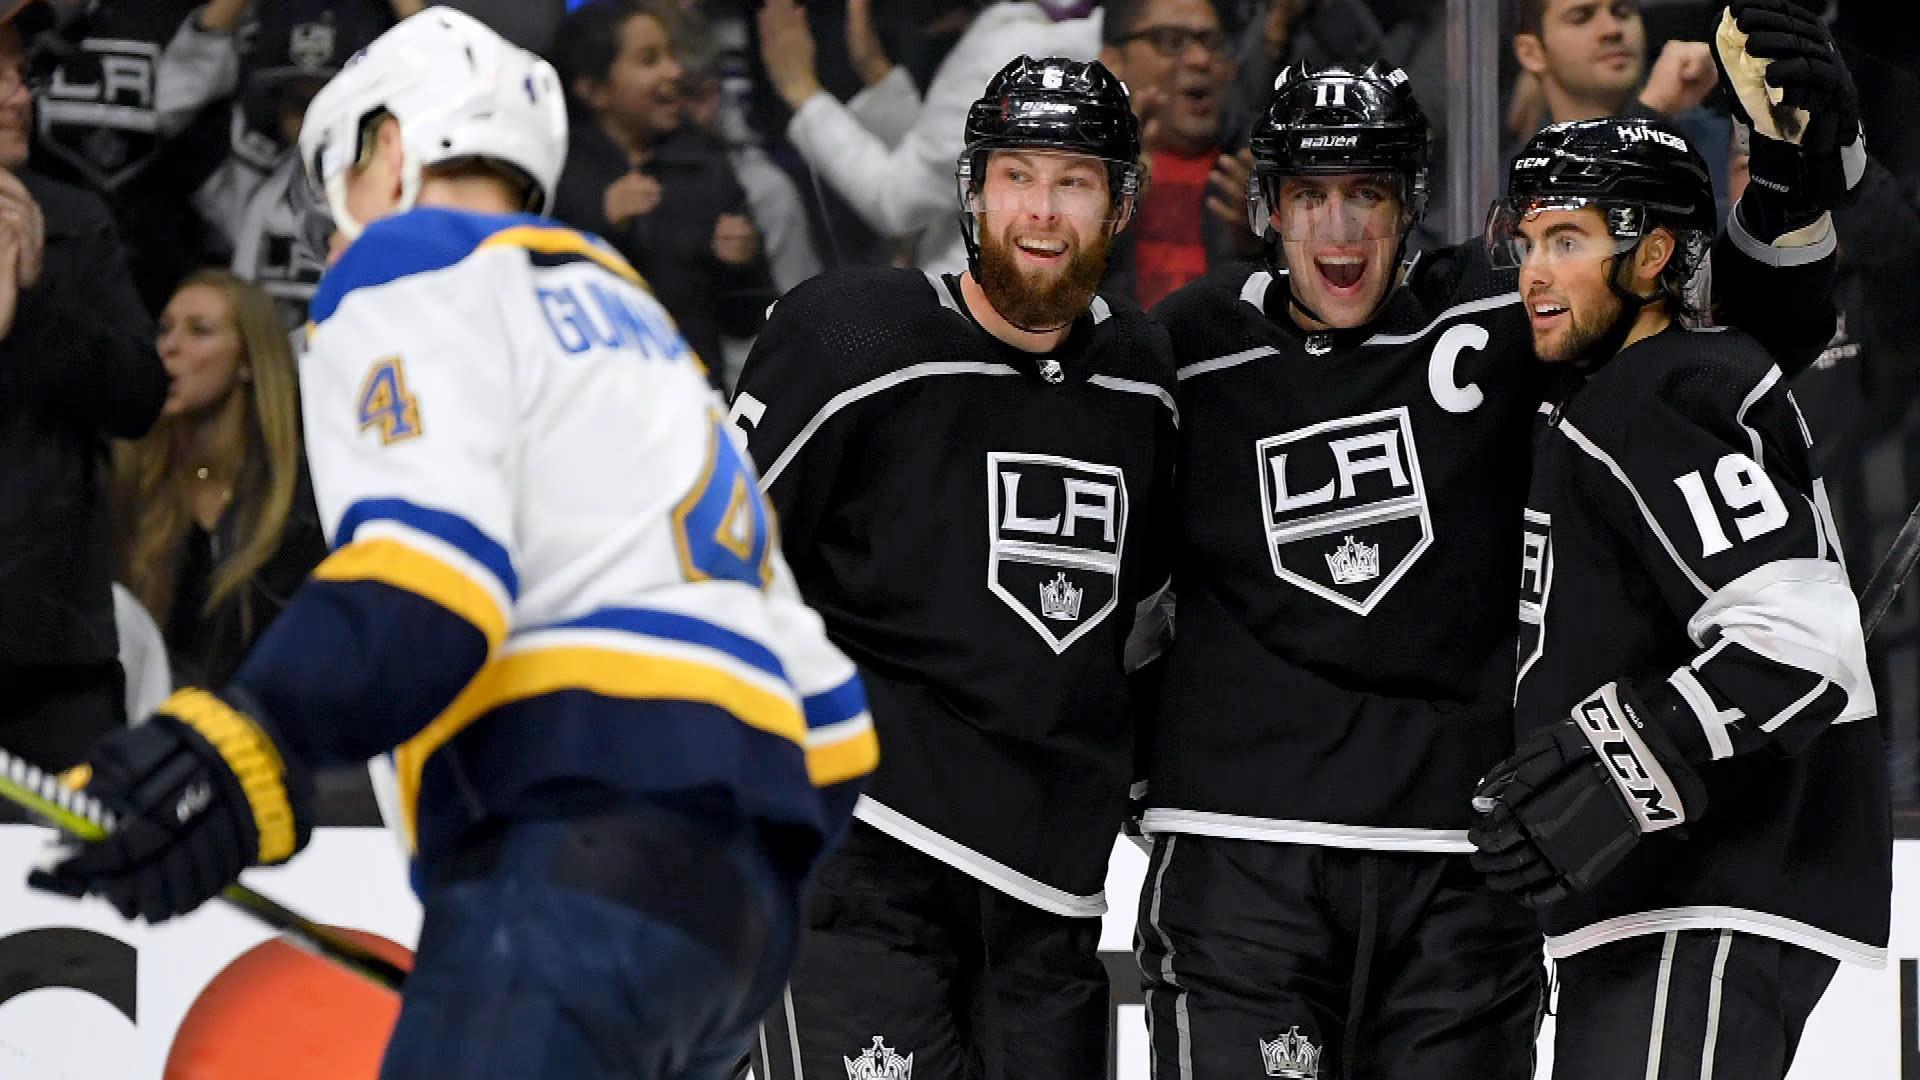 Highlights: Los Angeles Kings 4, St. Louis Blues 3